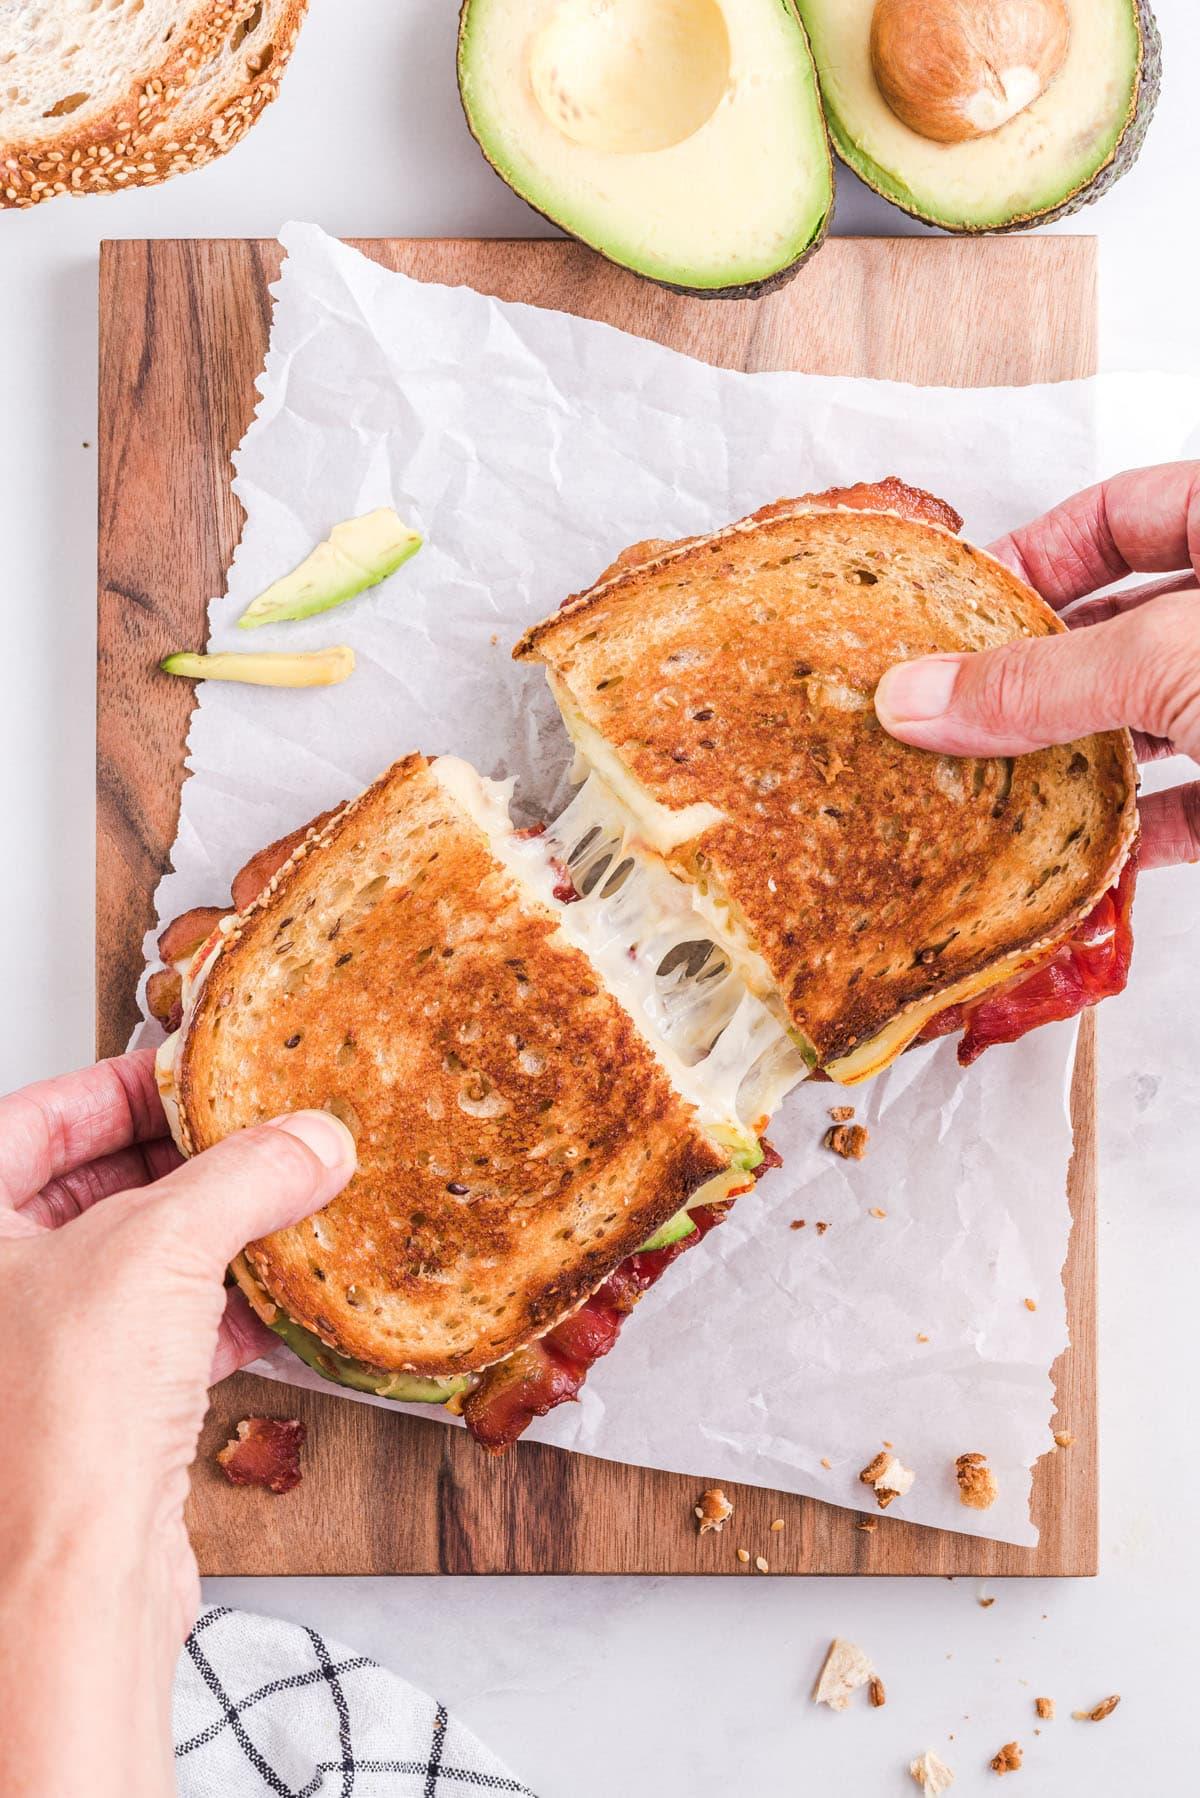 hand splitting the bacon avocado sandwich in half